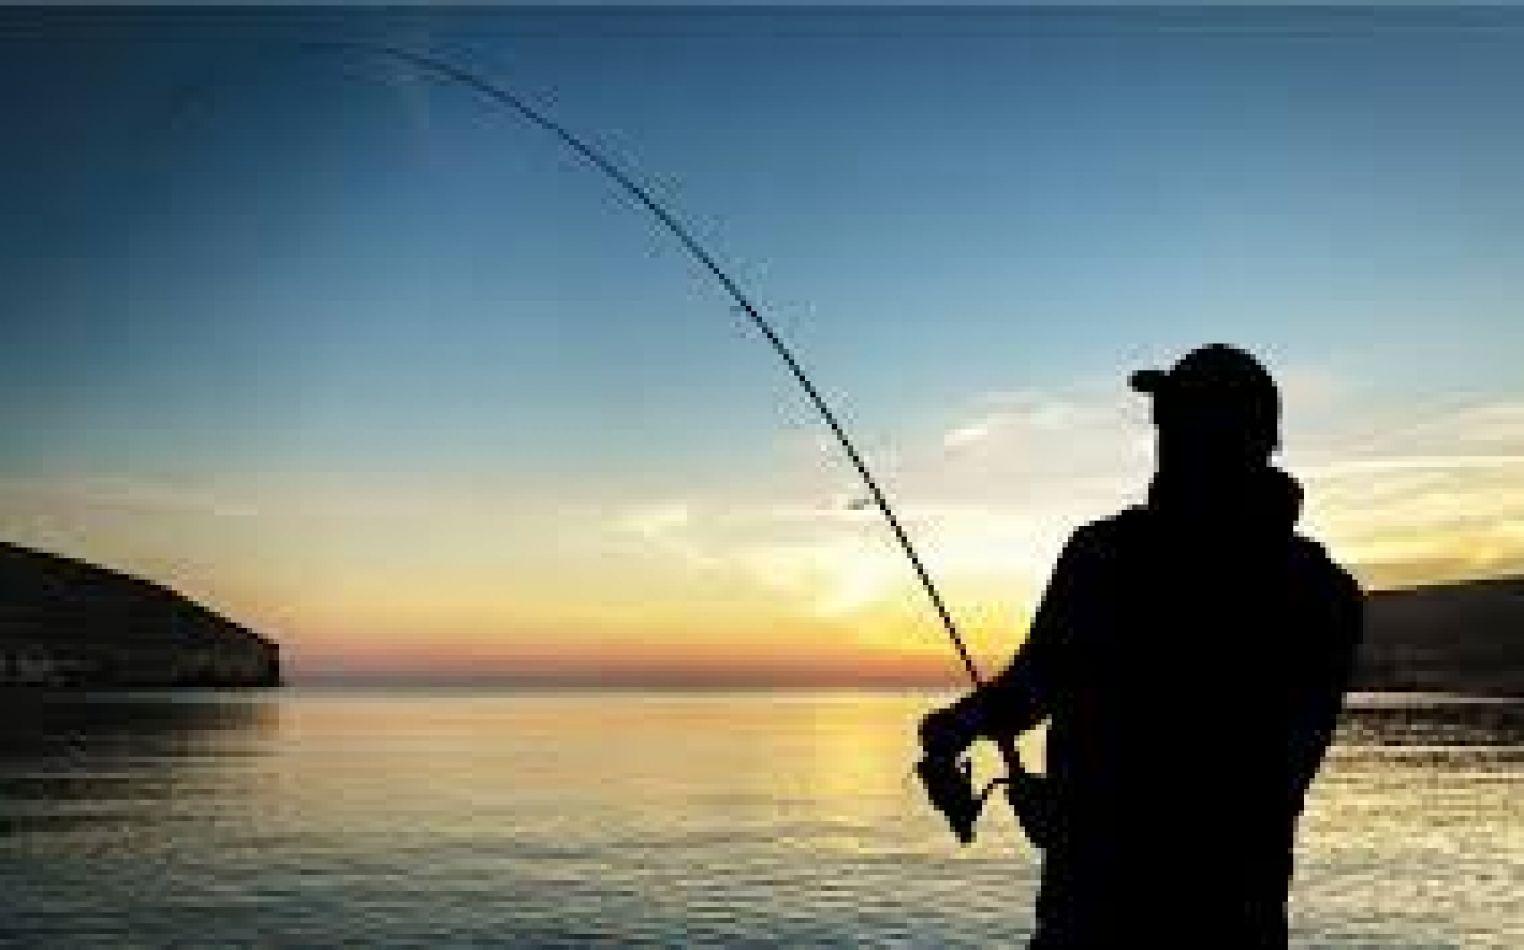 Pesca habilitada